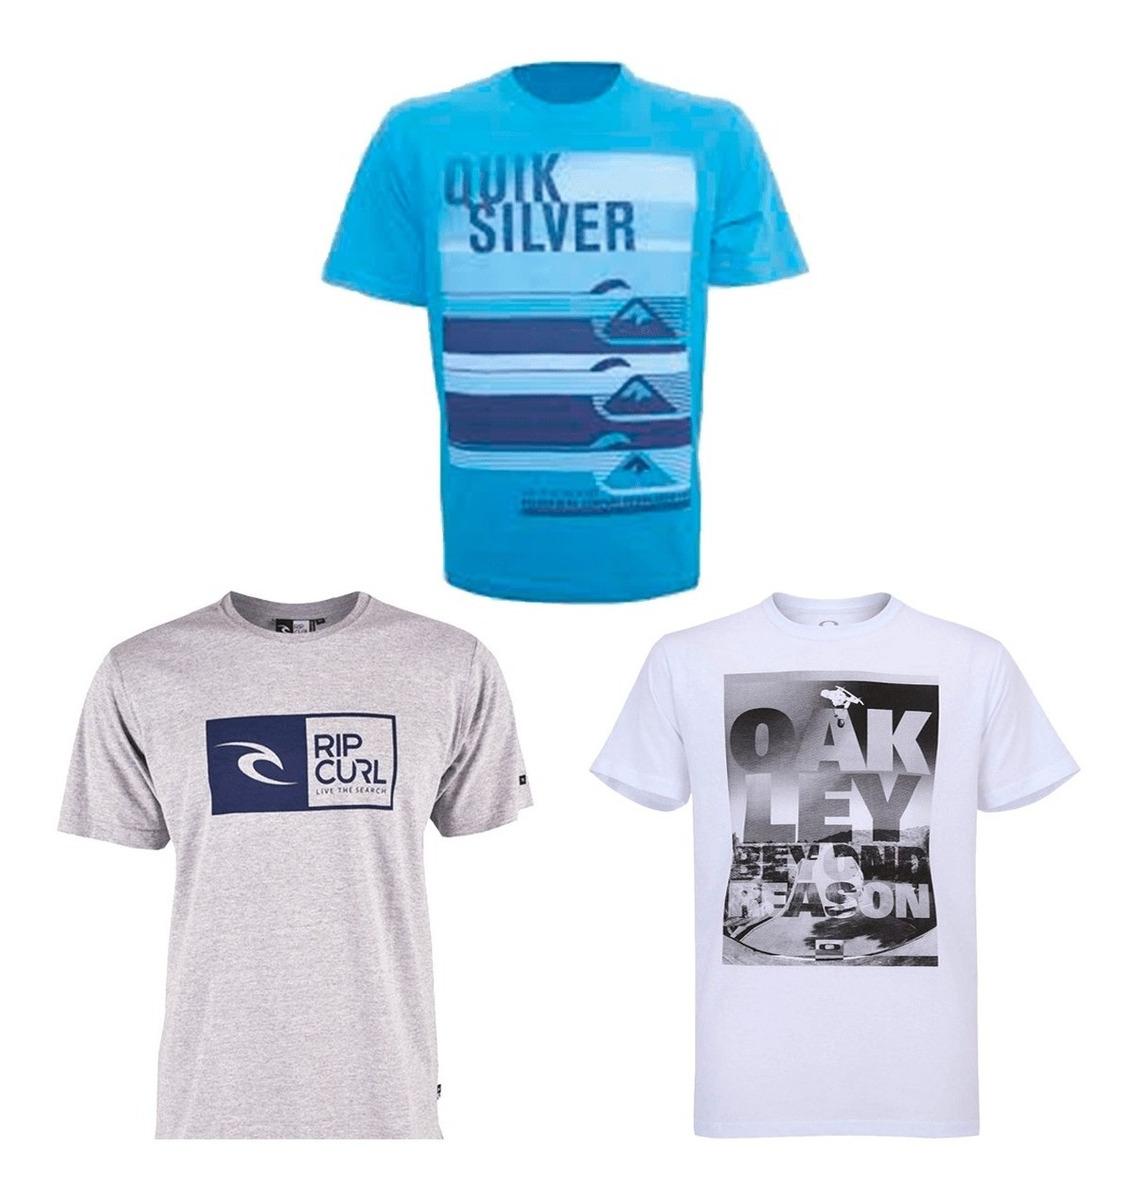 1107d606ace37 kit 10 camisa camiseta masculina marca estampada top revenda. Carregando  zoom.